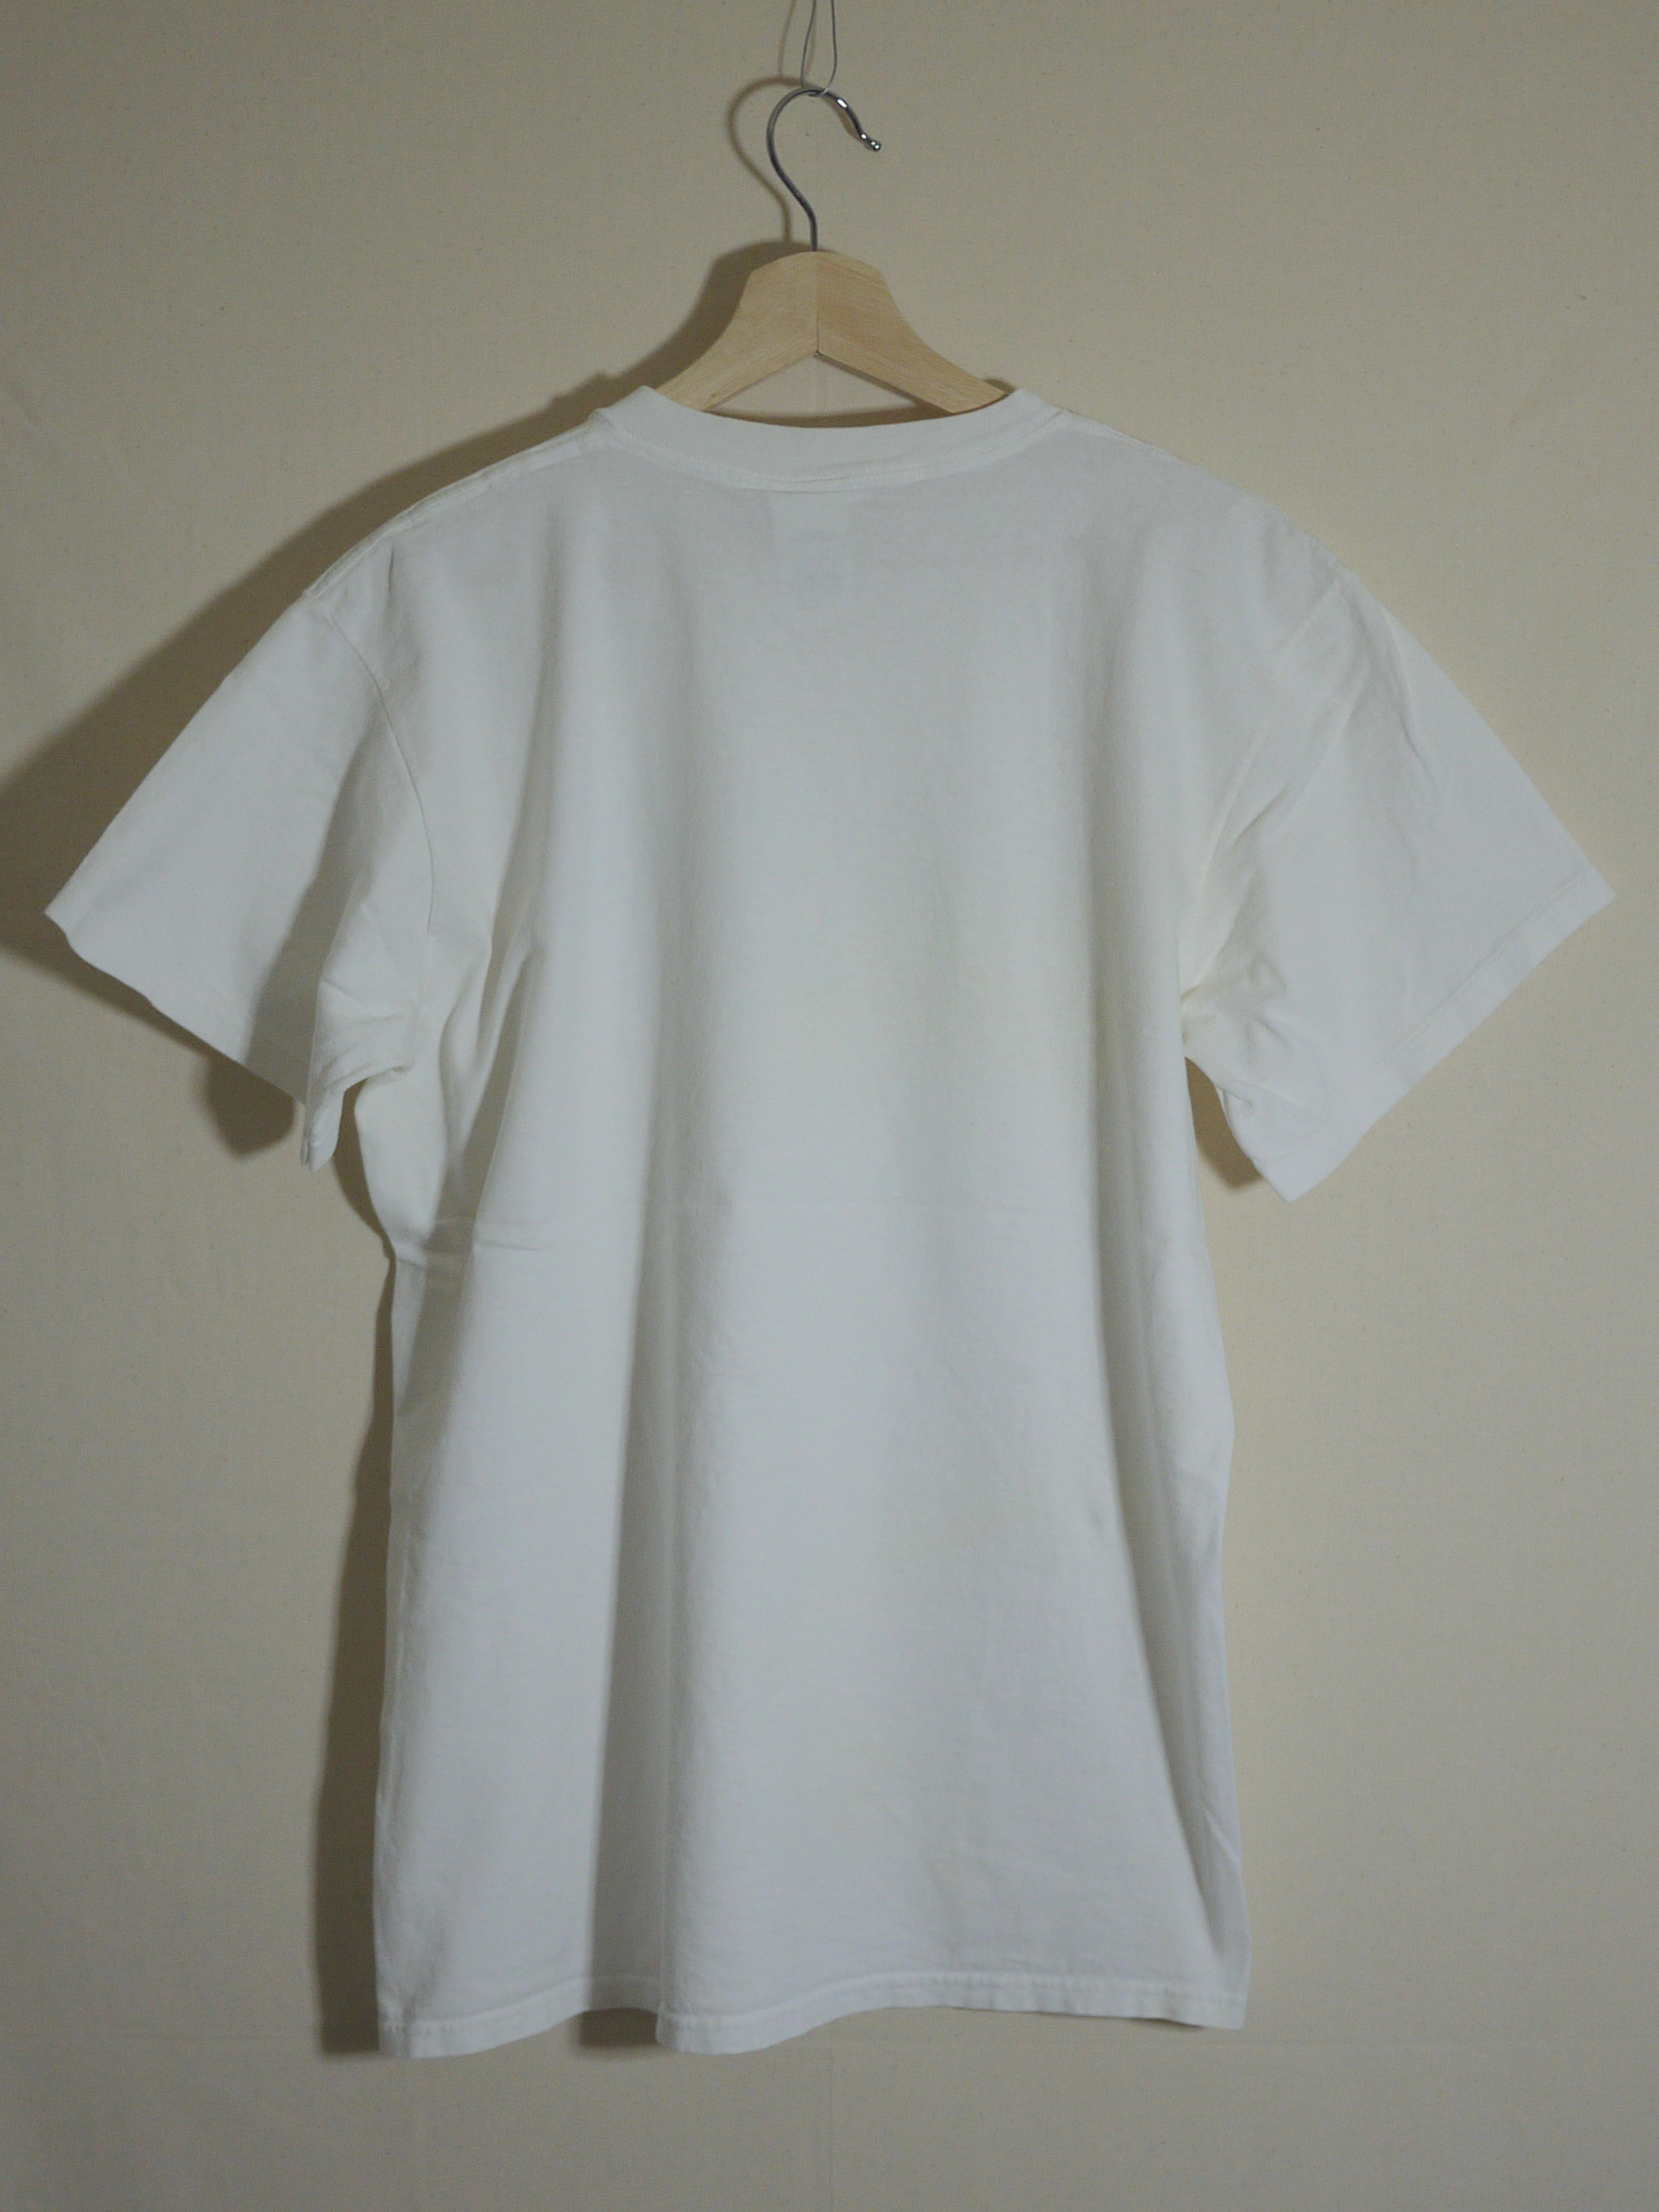 NIKE 1990's T-Shirts SizeL